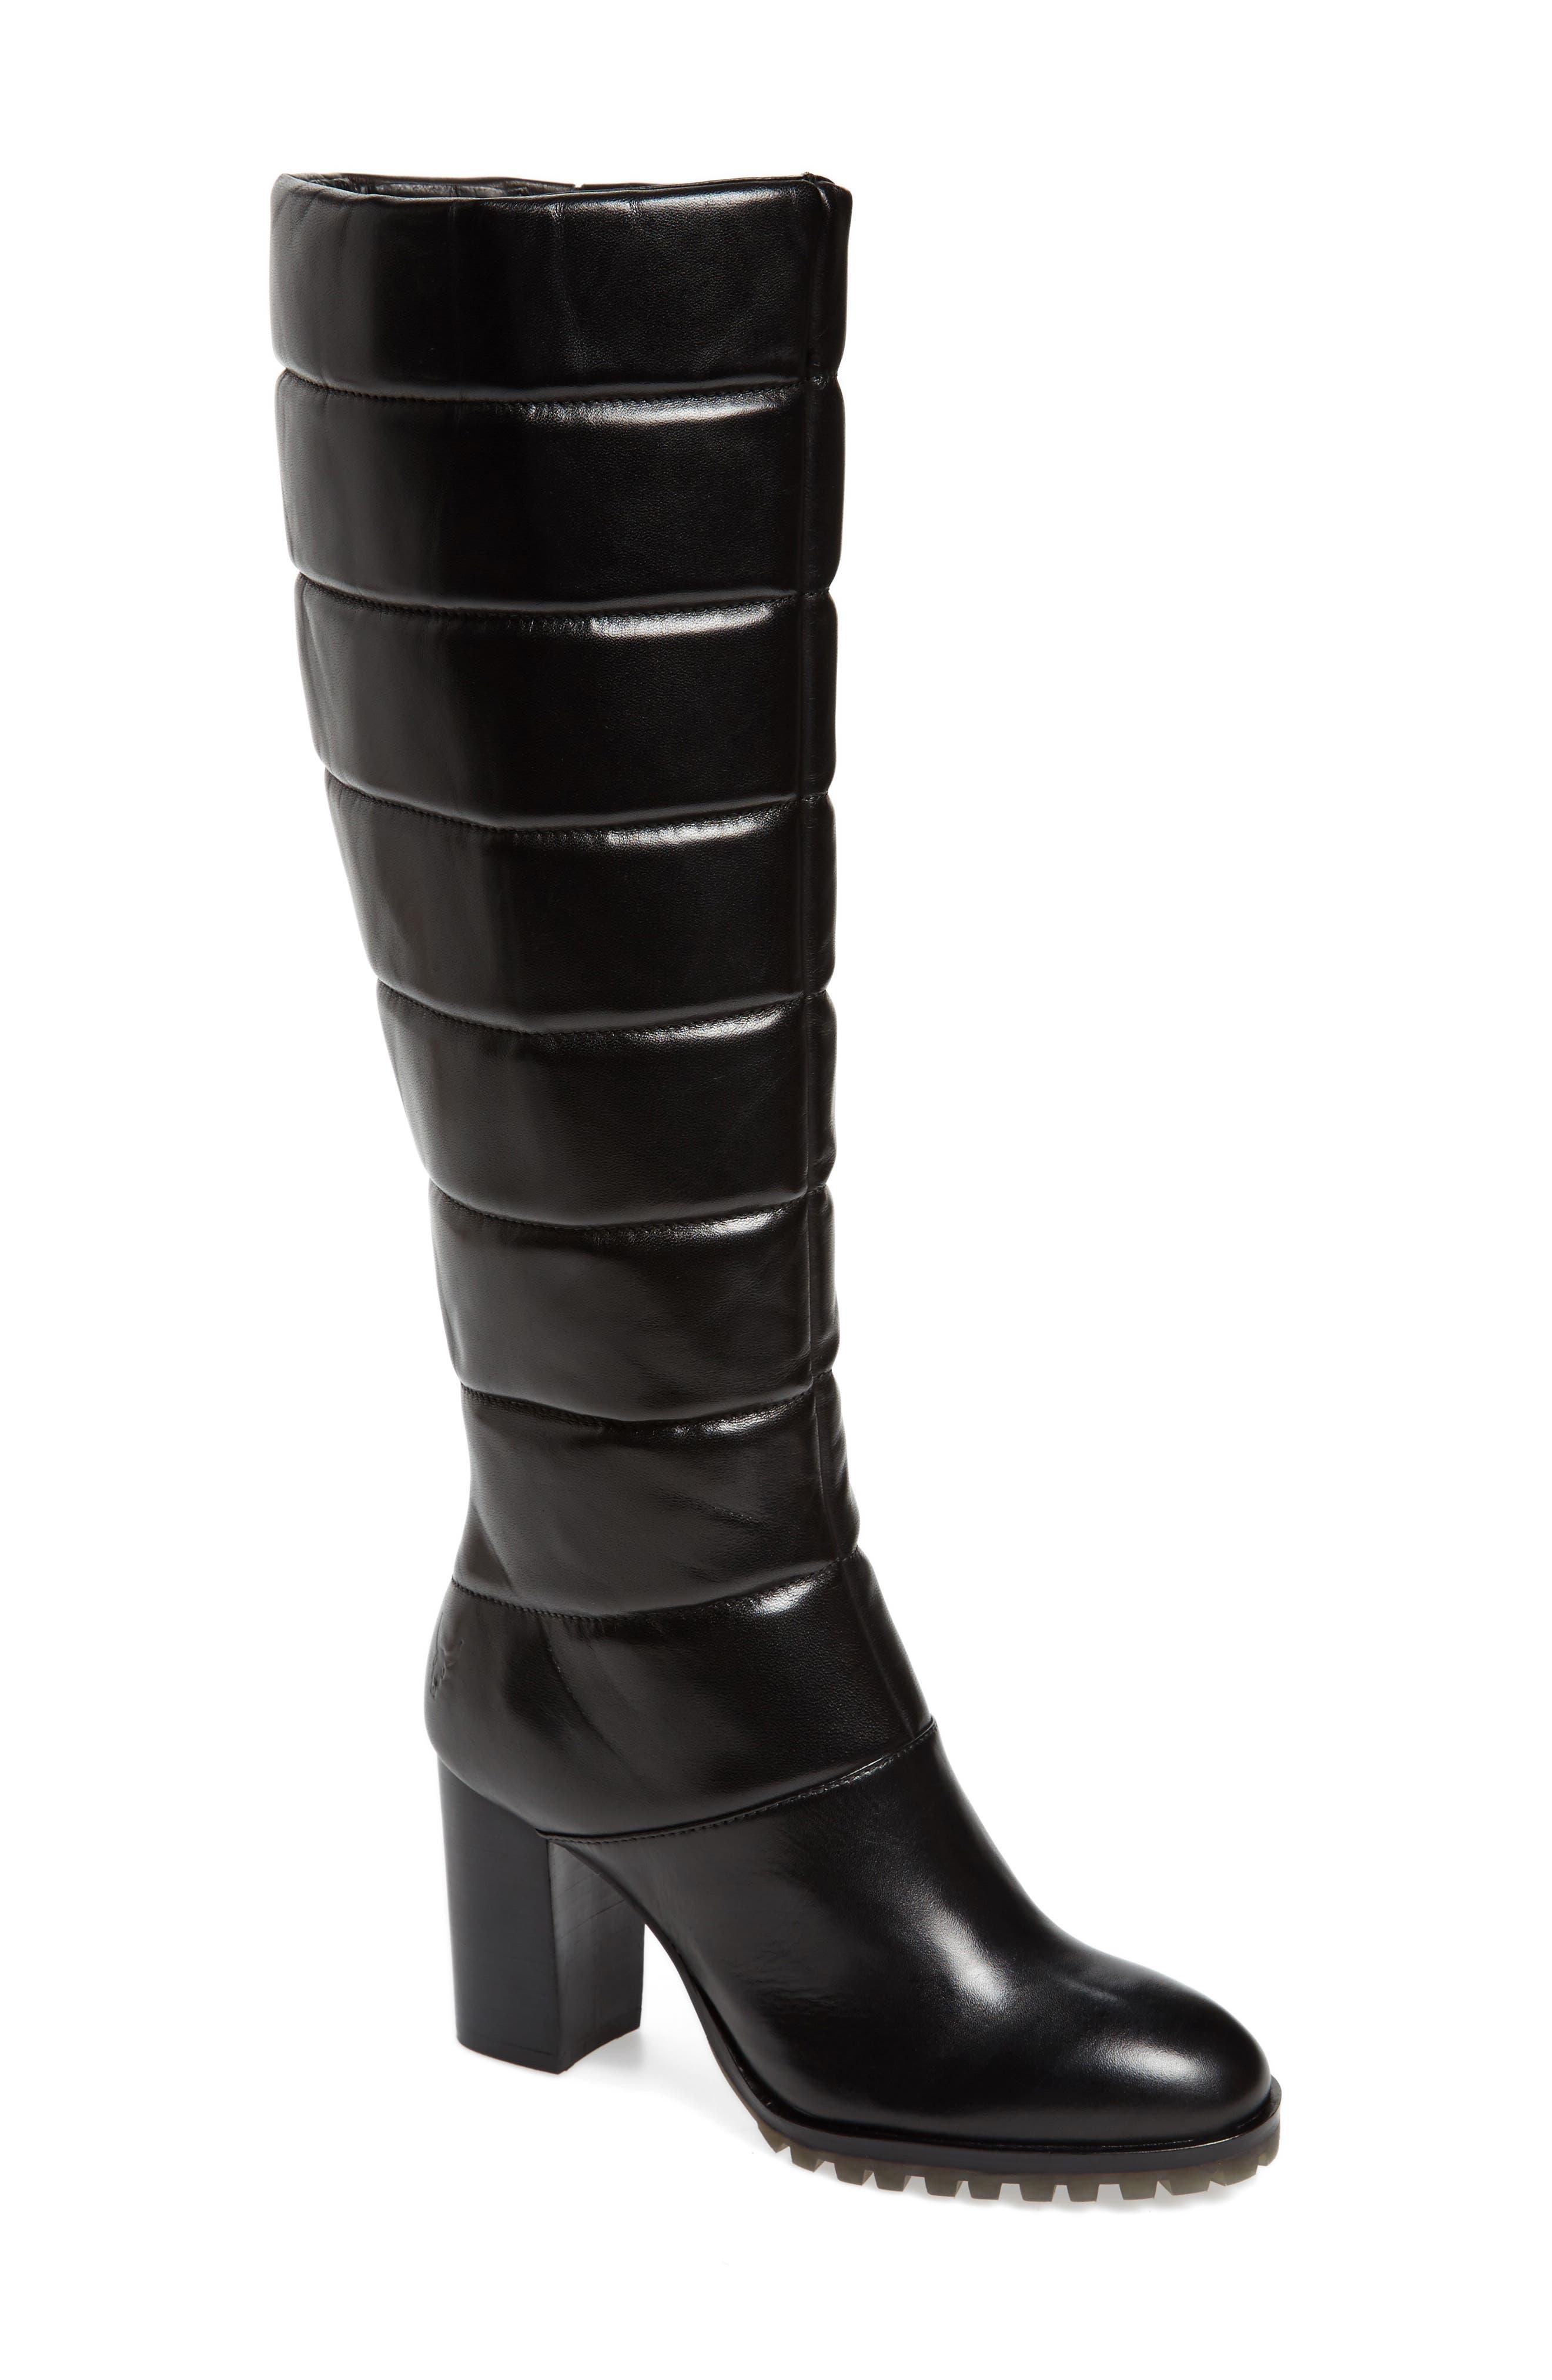 Tropia Knee High Boot,                             Main thumbnail 1, color,                             Black Leather